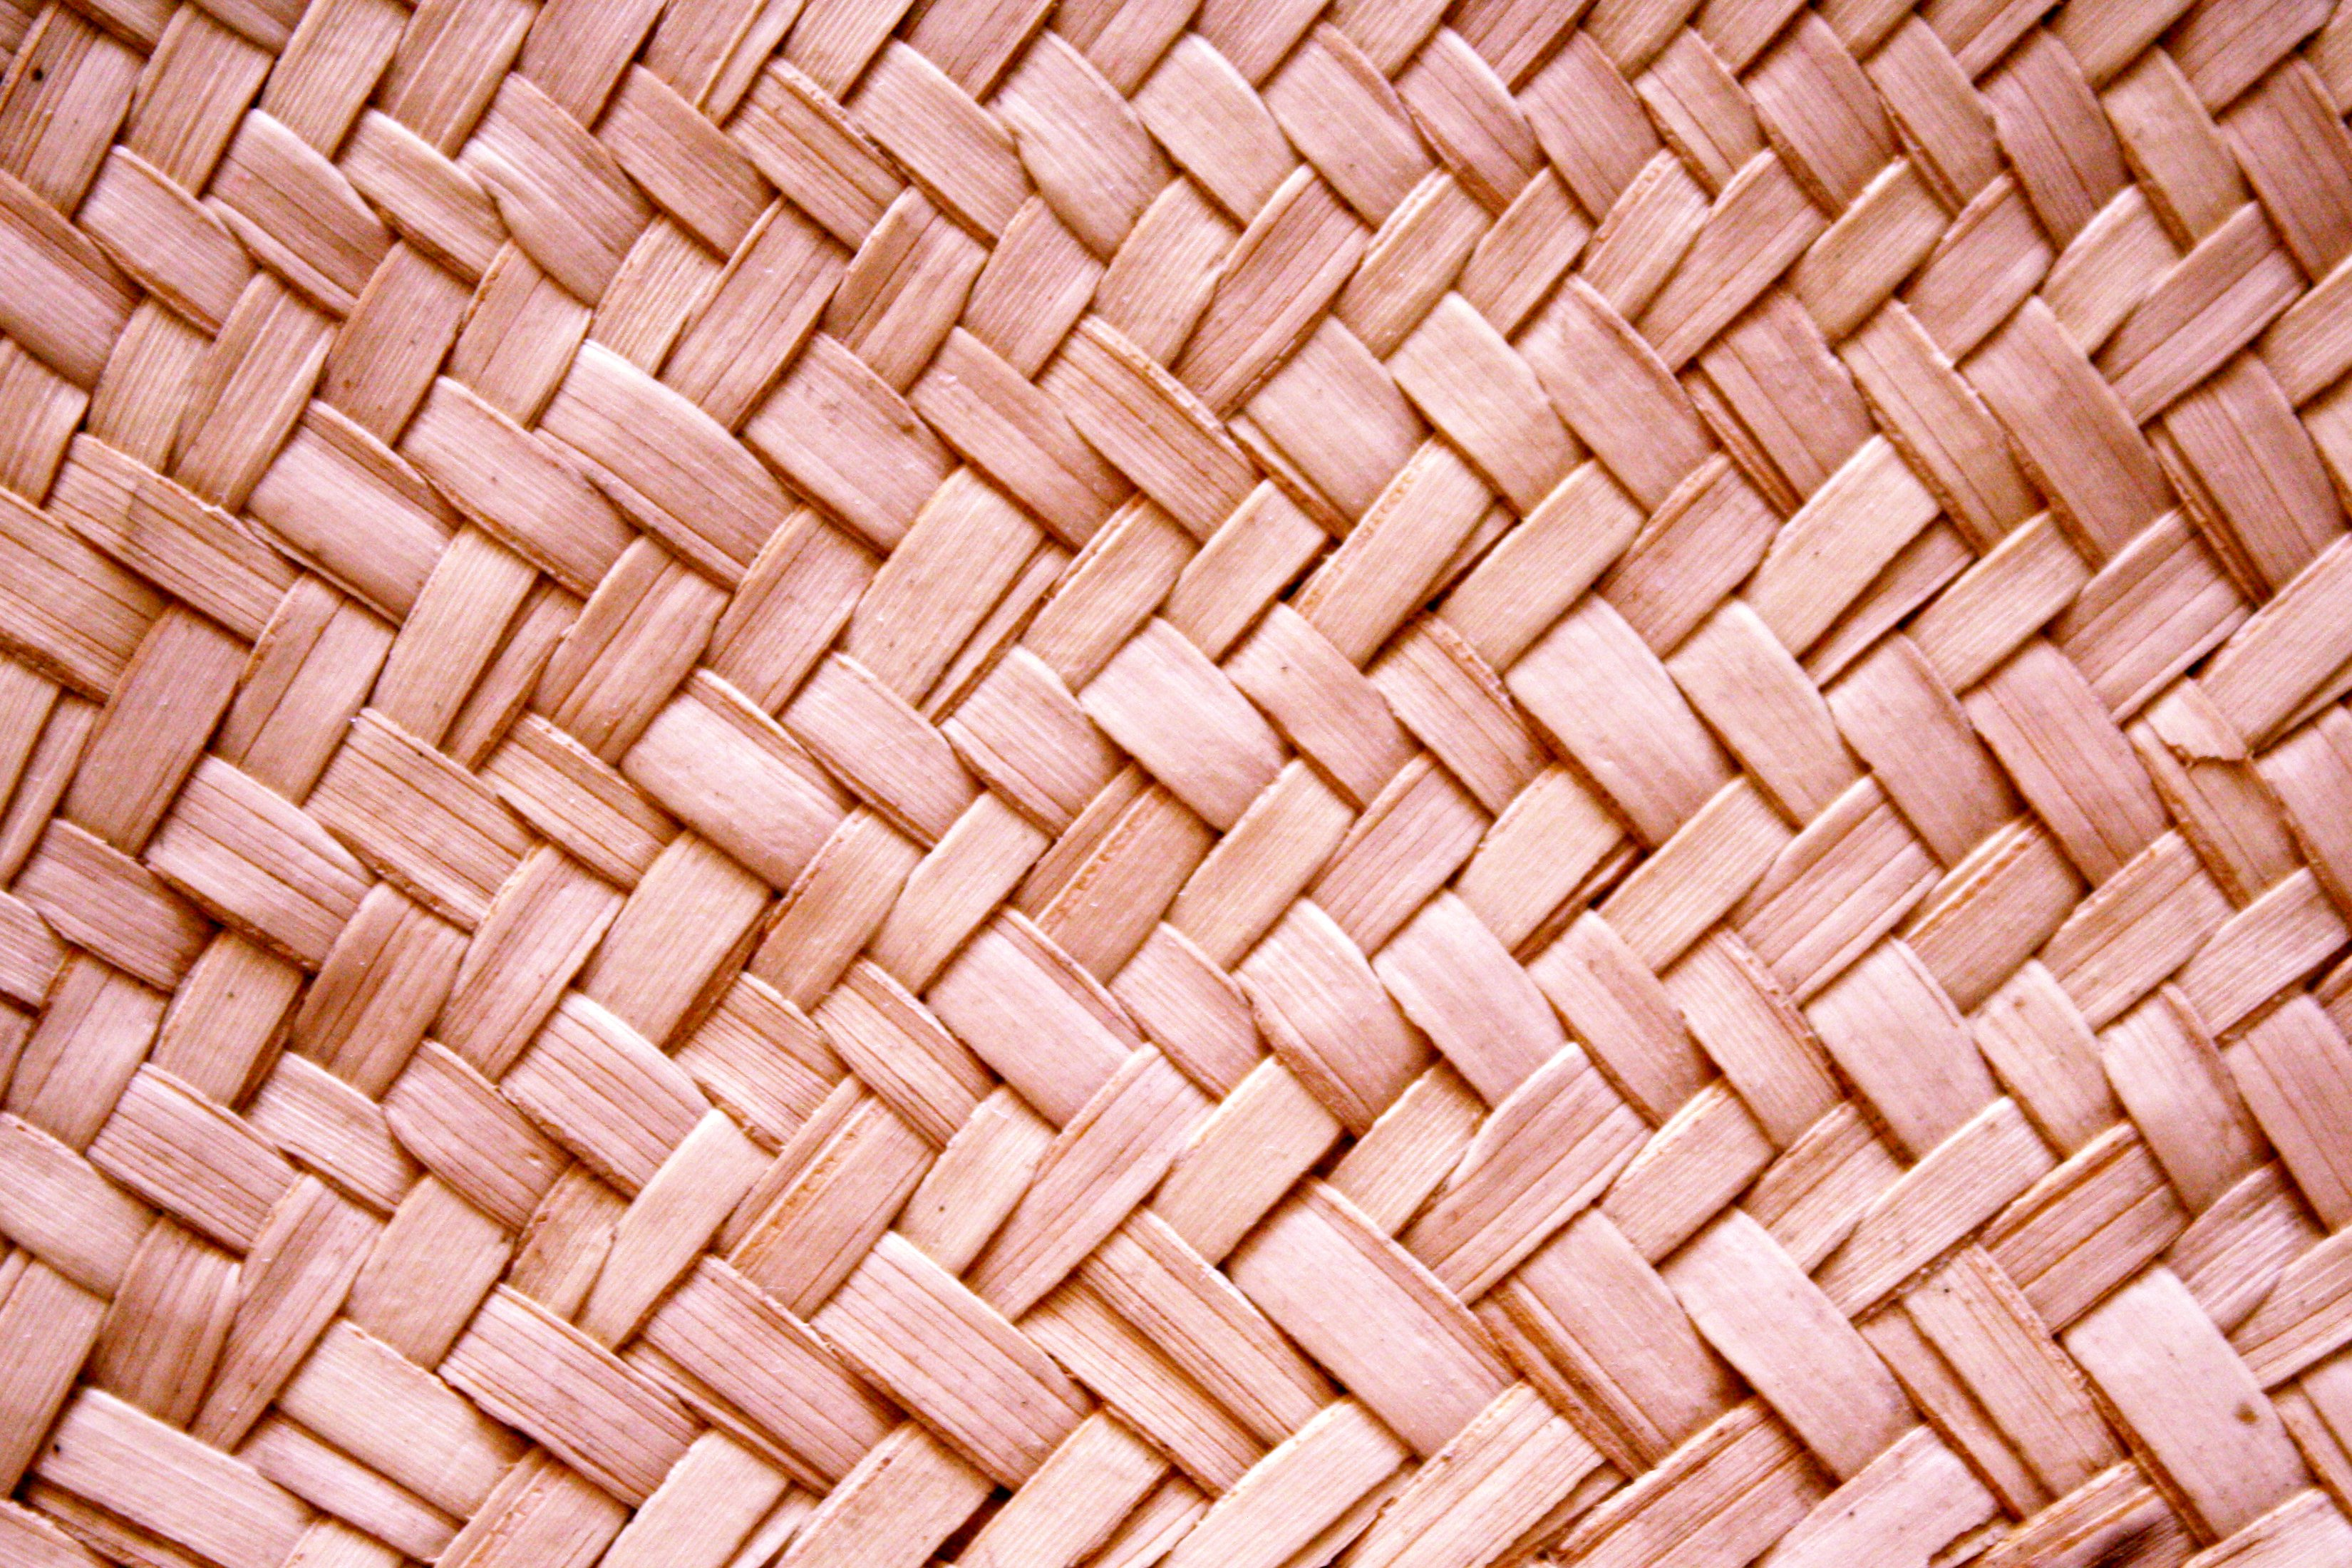 texture , download photo, background, straw texture background